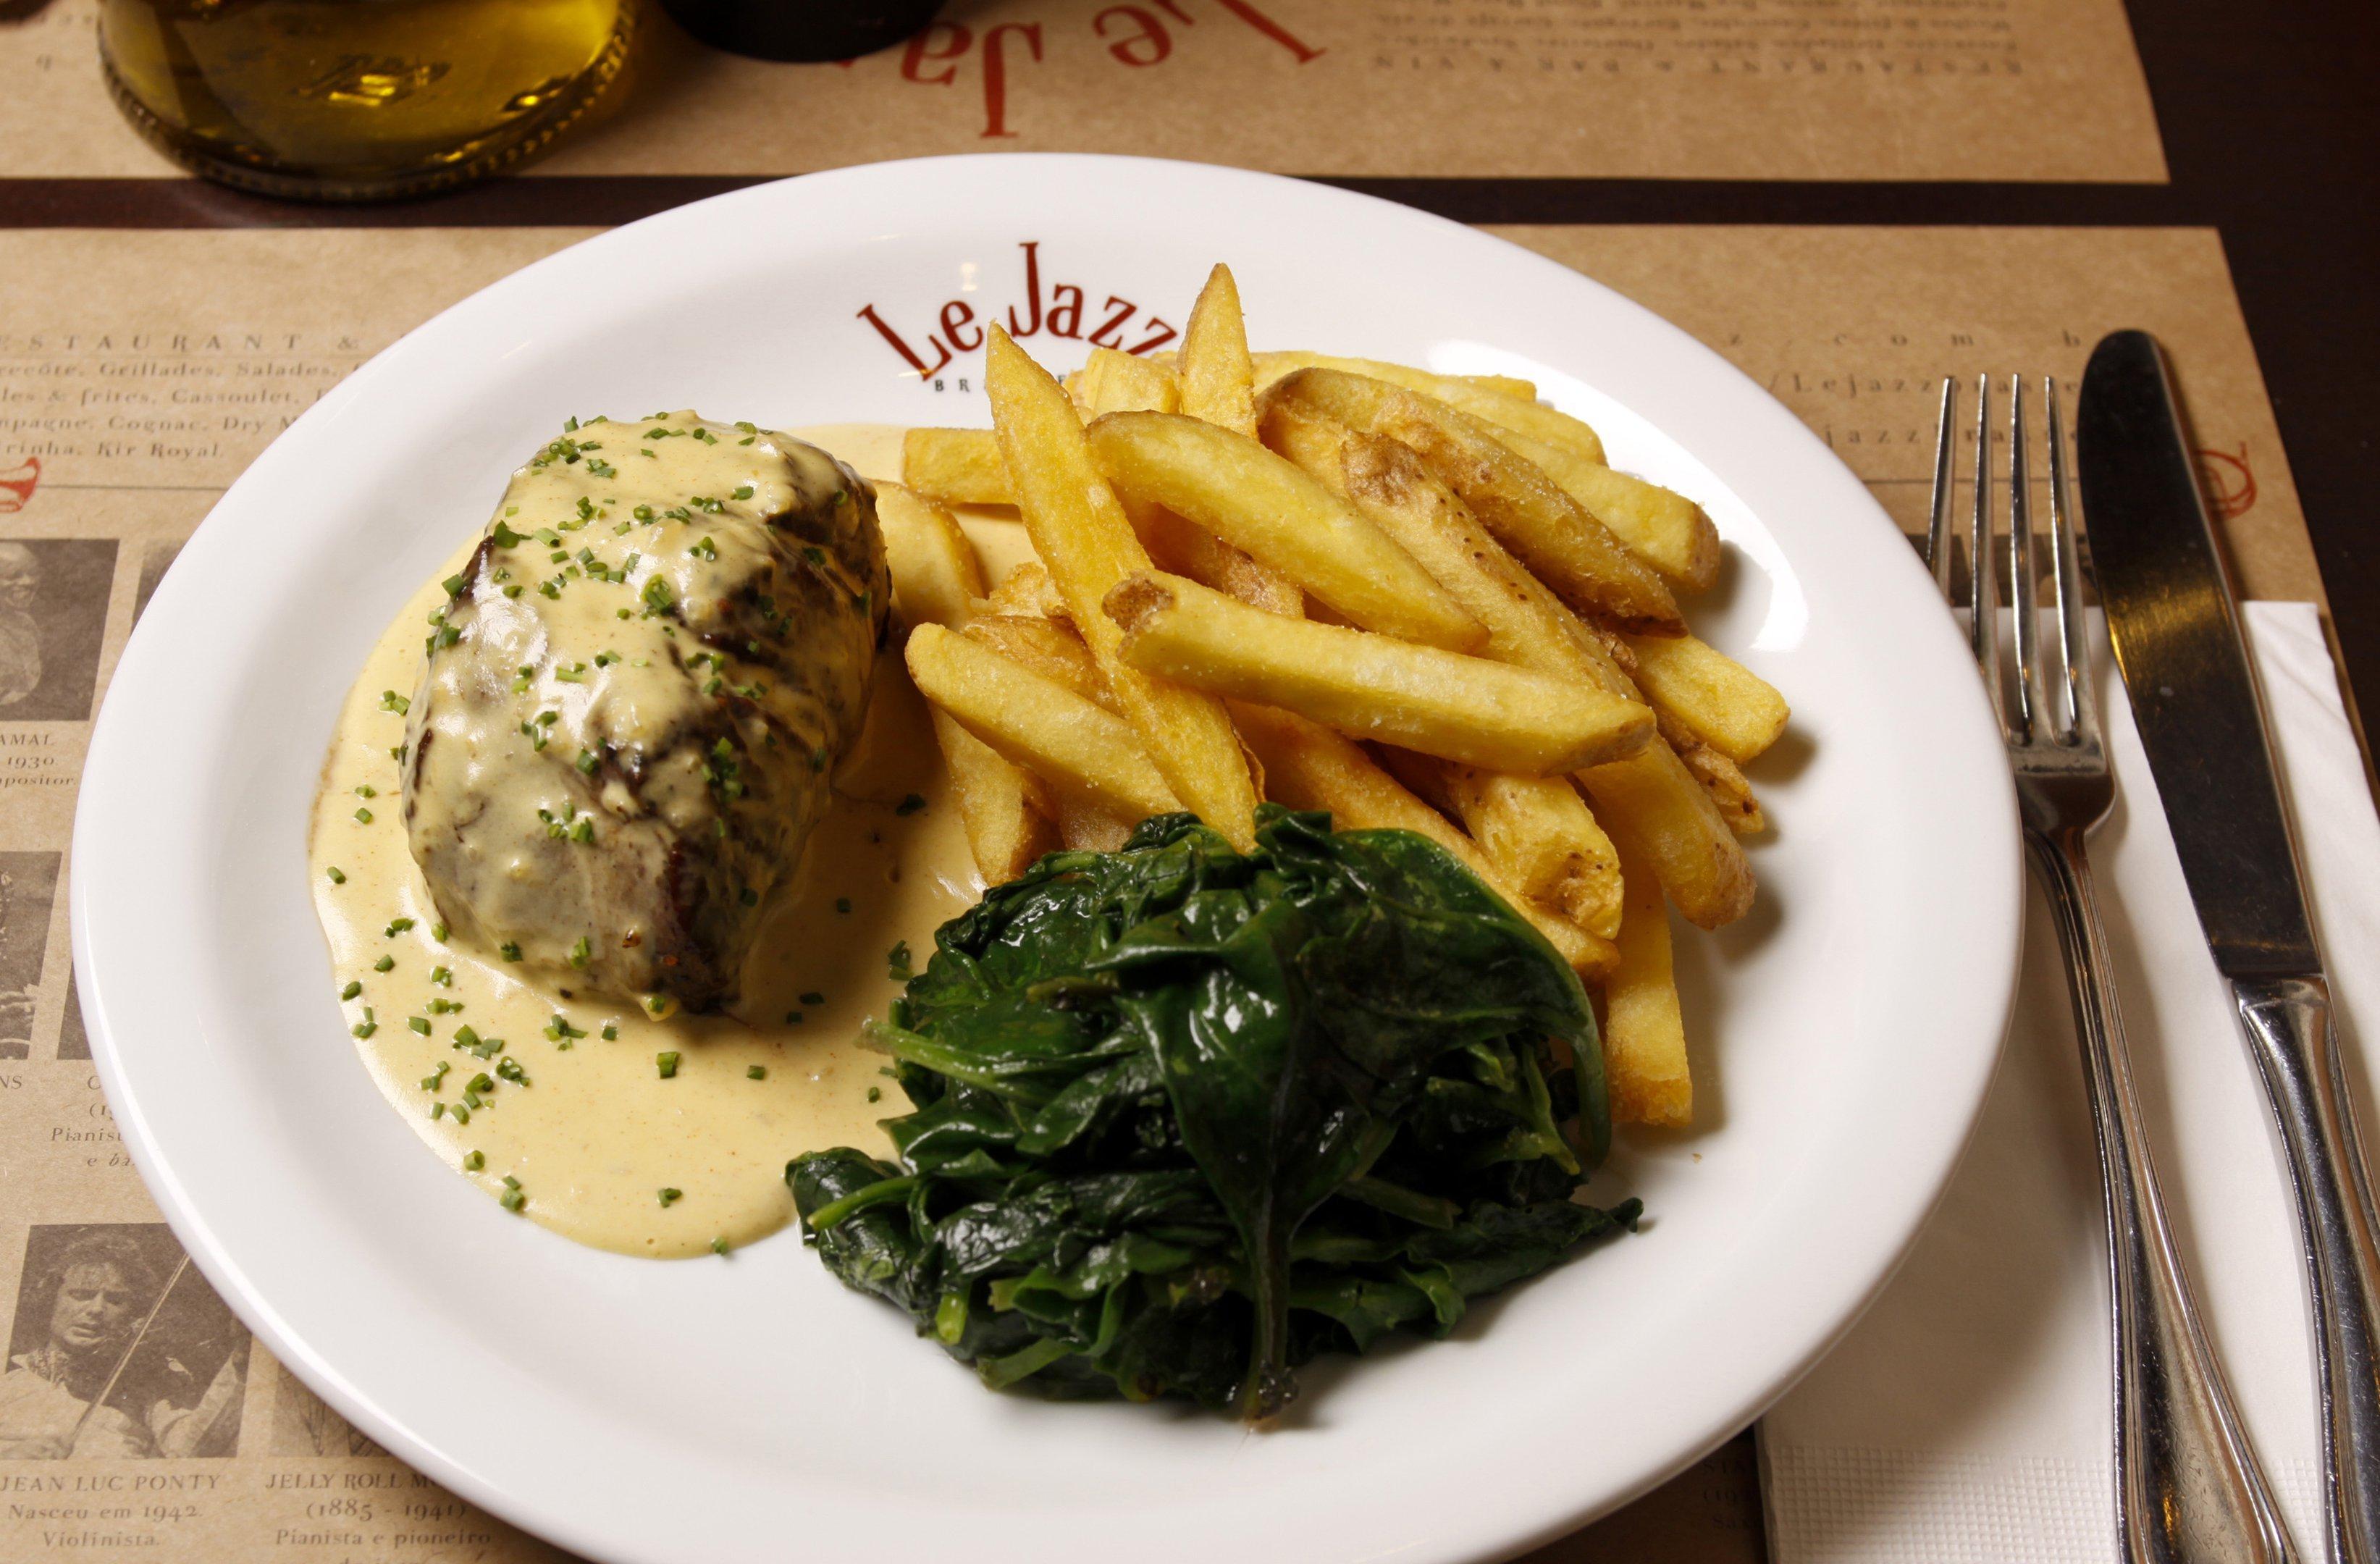 Le Jazz Brasserie: Filet à la Moutarde